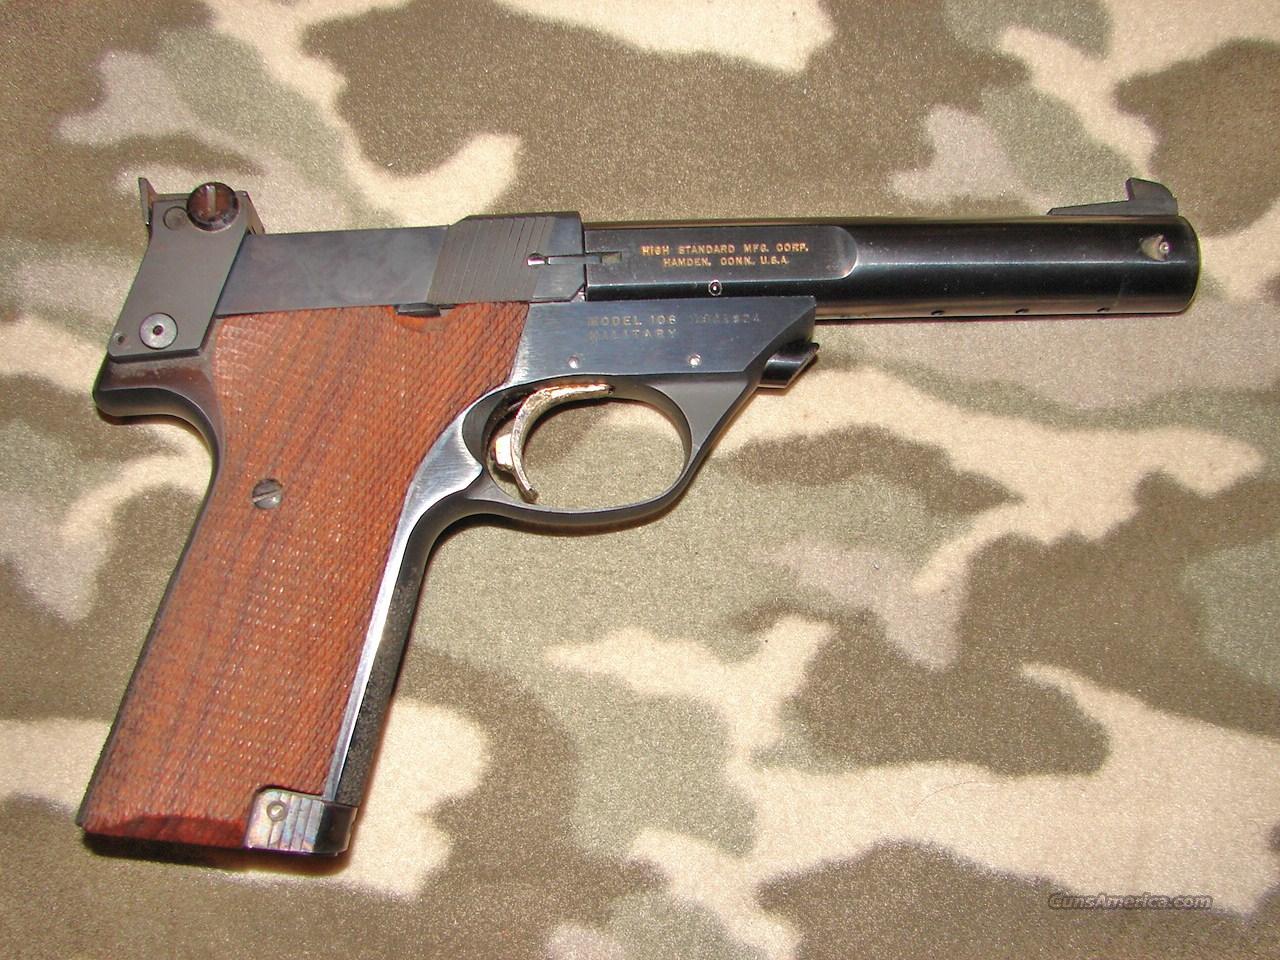 High Standard Sup Tro   Guns > Pistols > High Standard Pistols